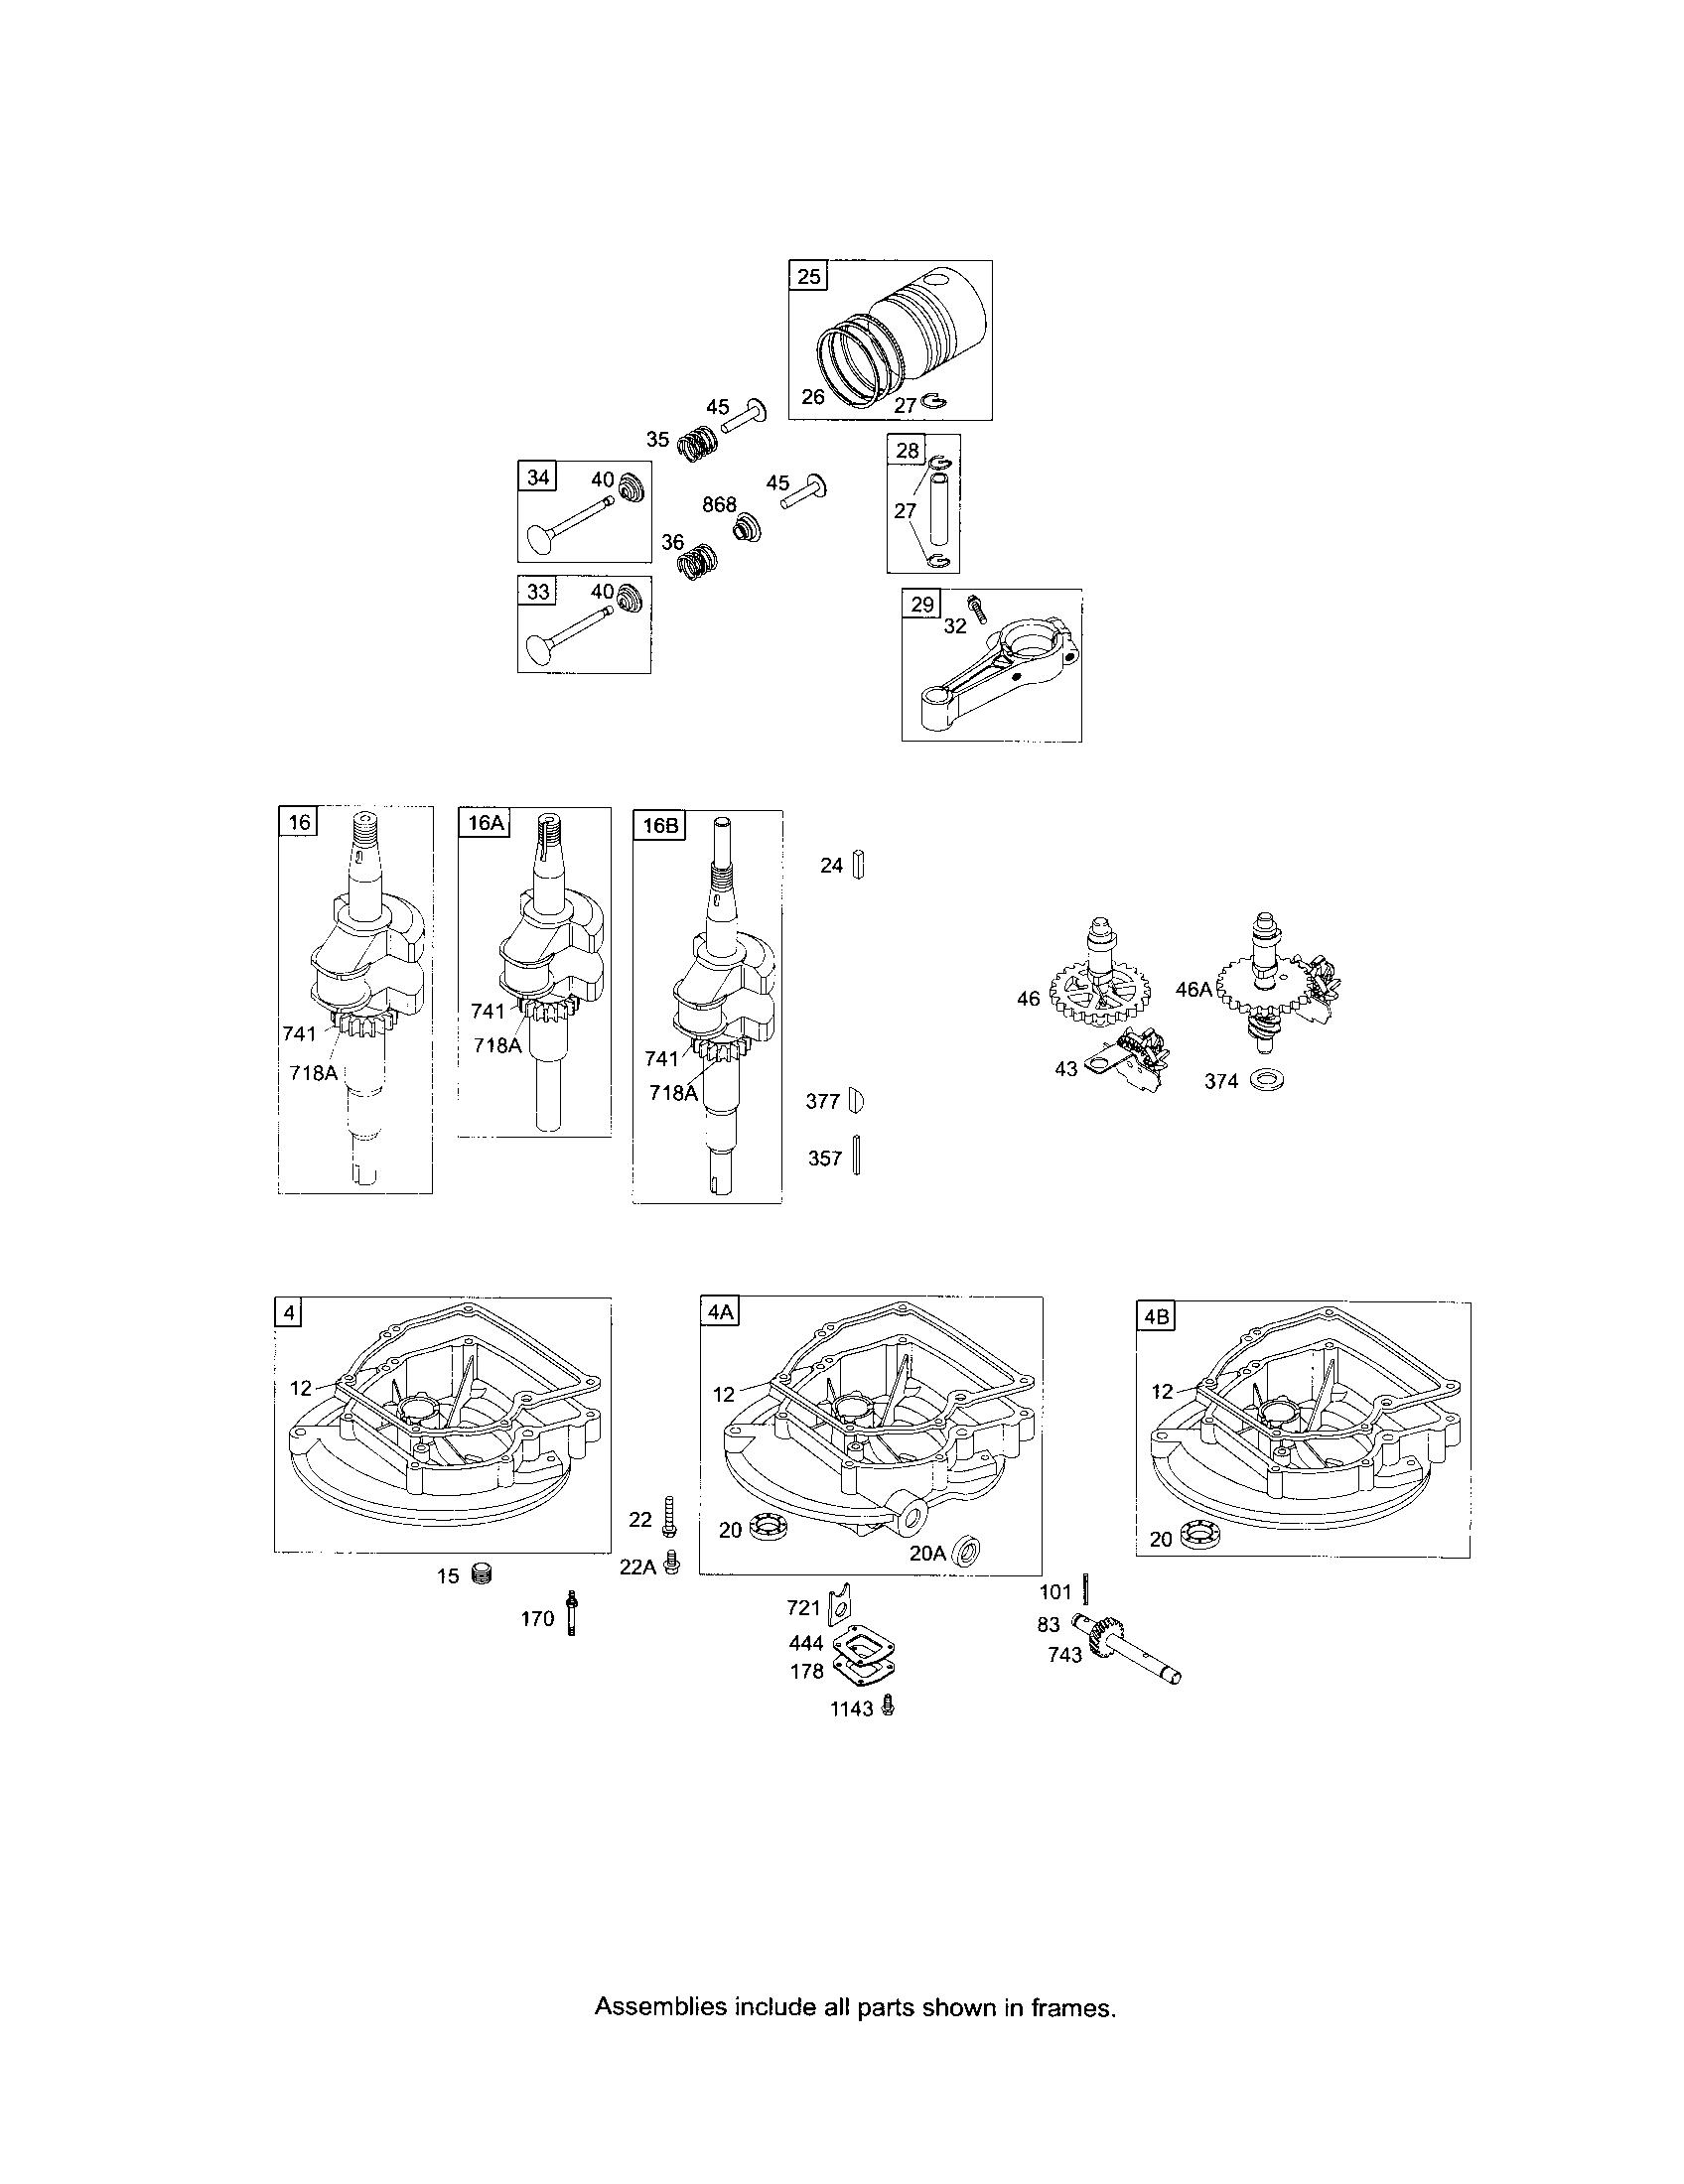 hight resolution of briggs stratton 10d902 0133 b2 engine sump diagram